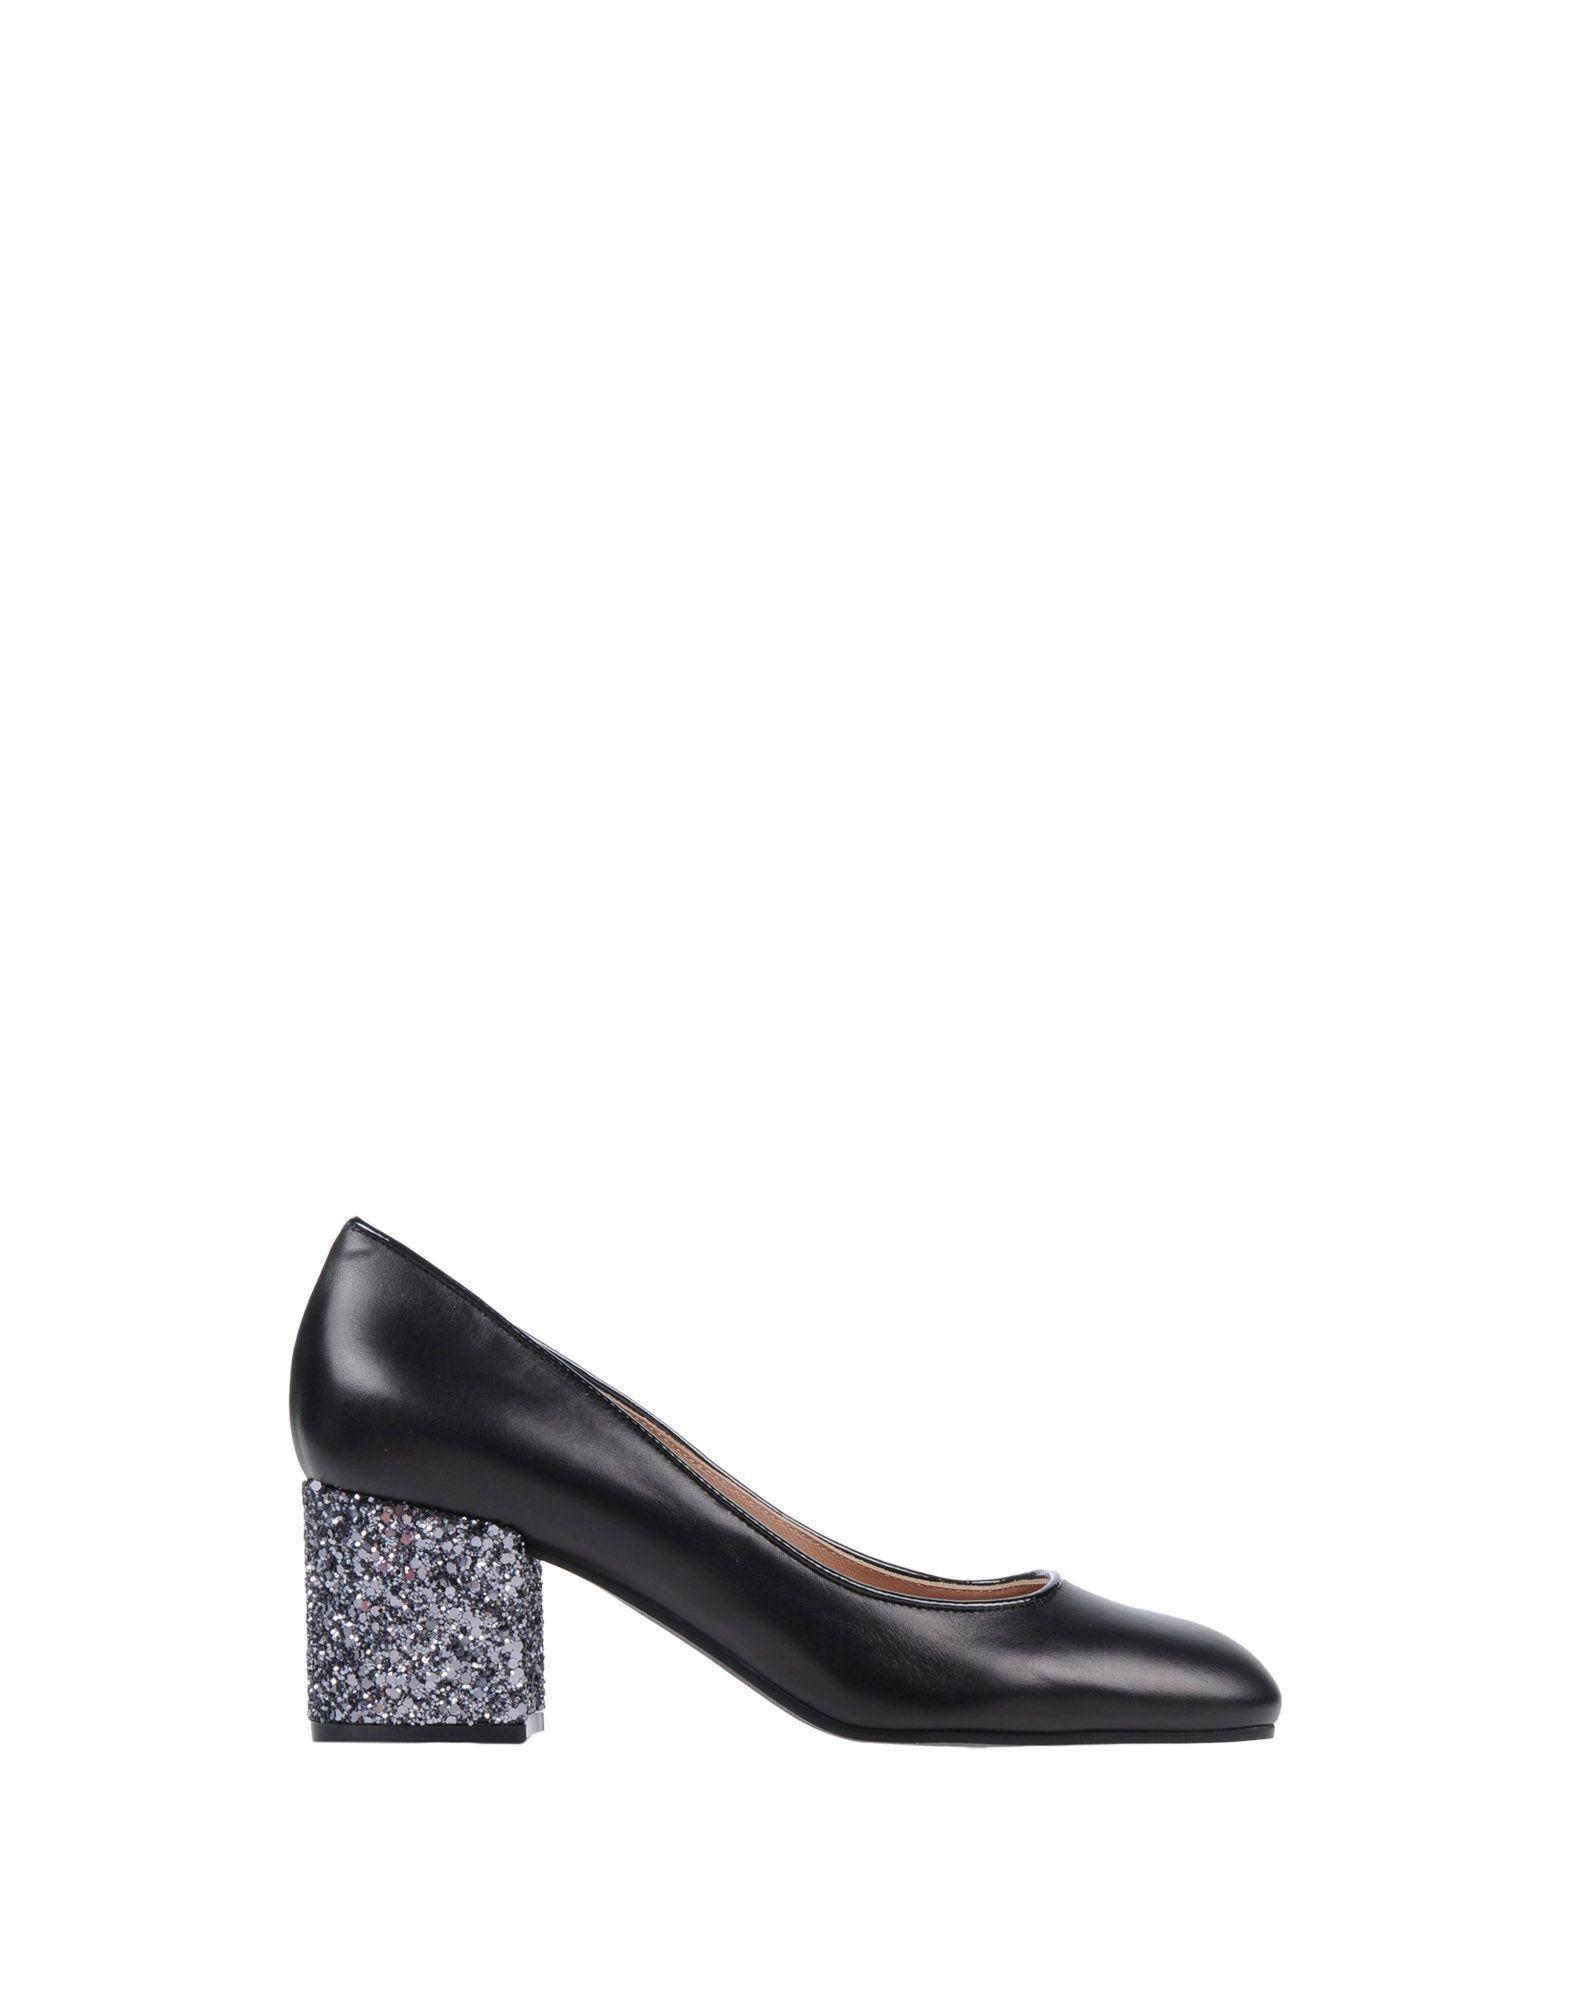 Pollini Black Calf Leather Heels